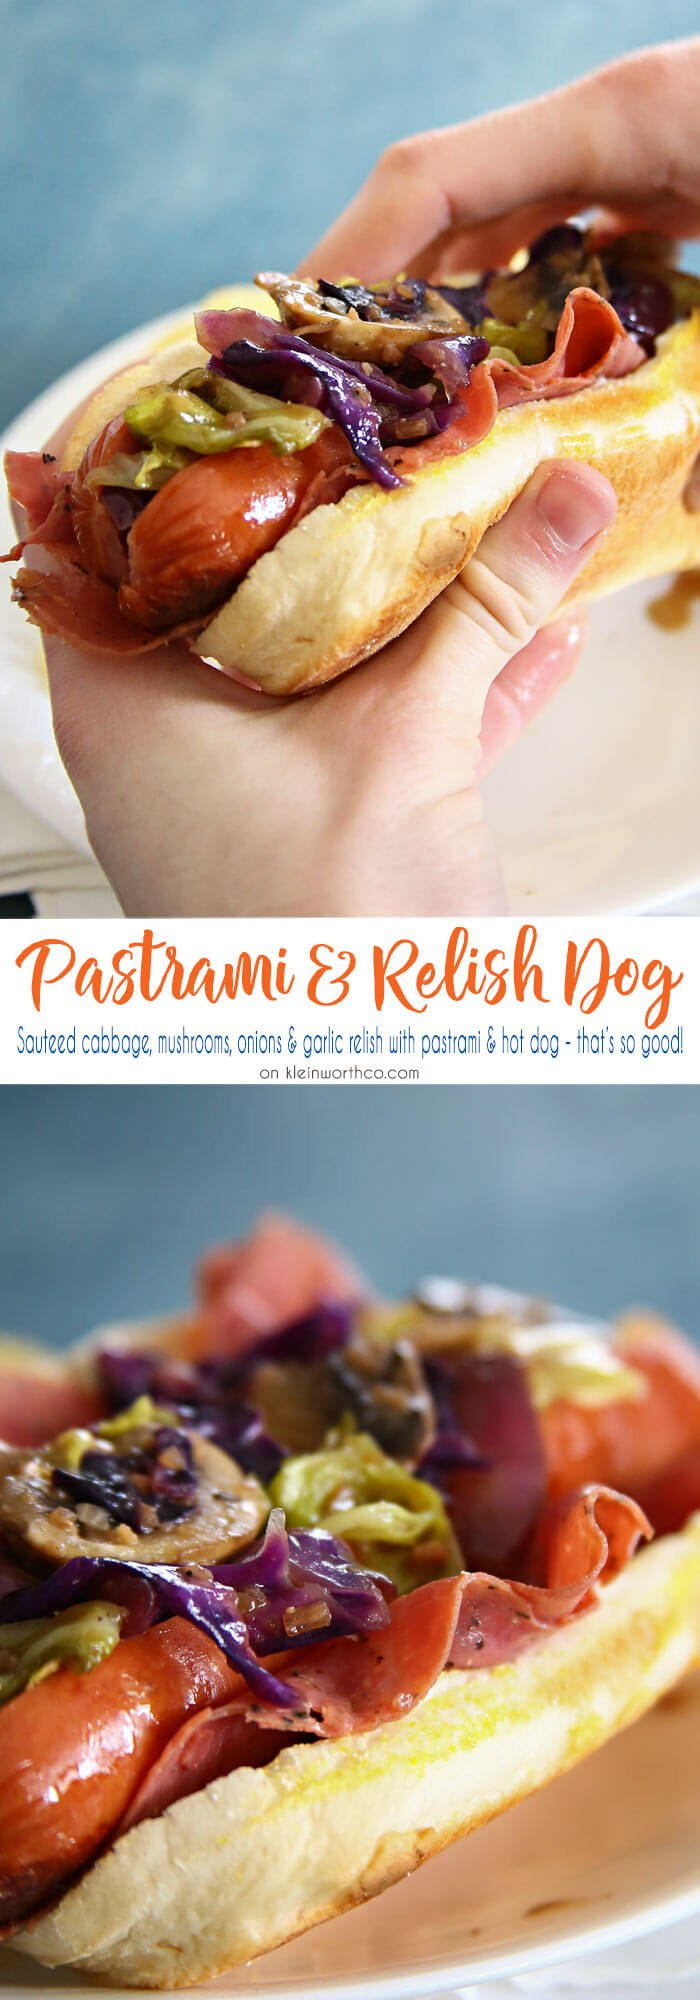 Pastrami & Relish Dog